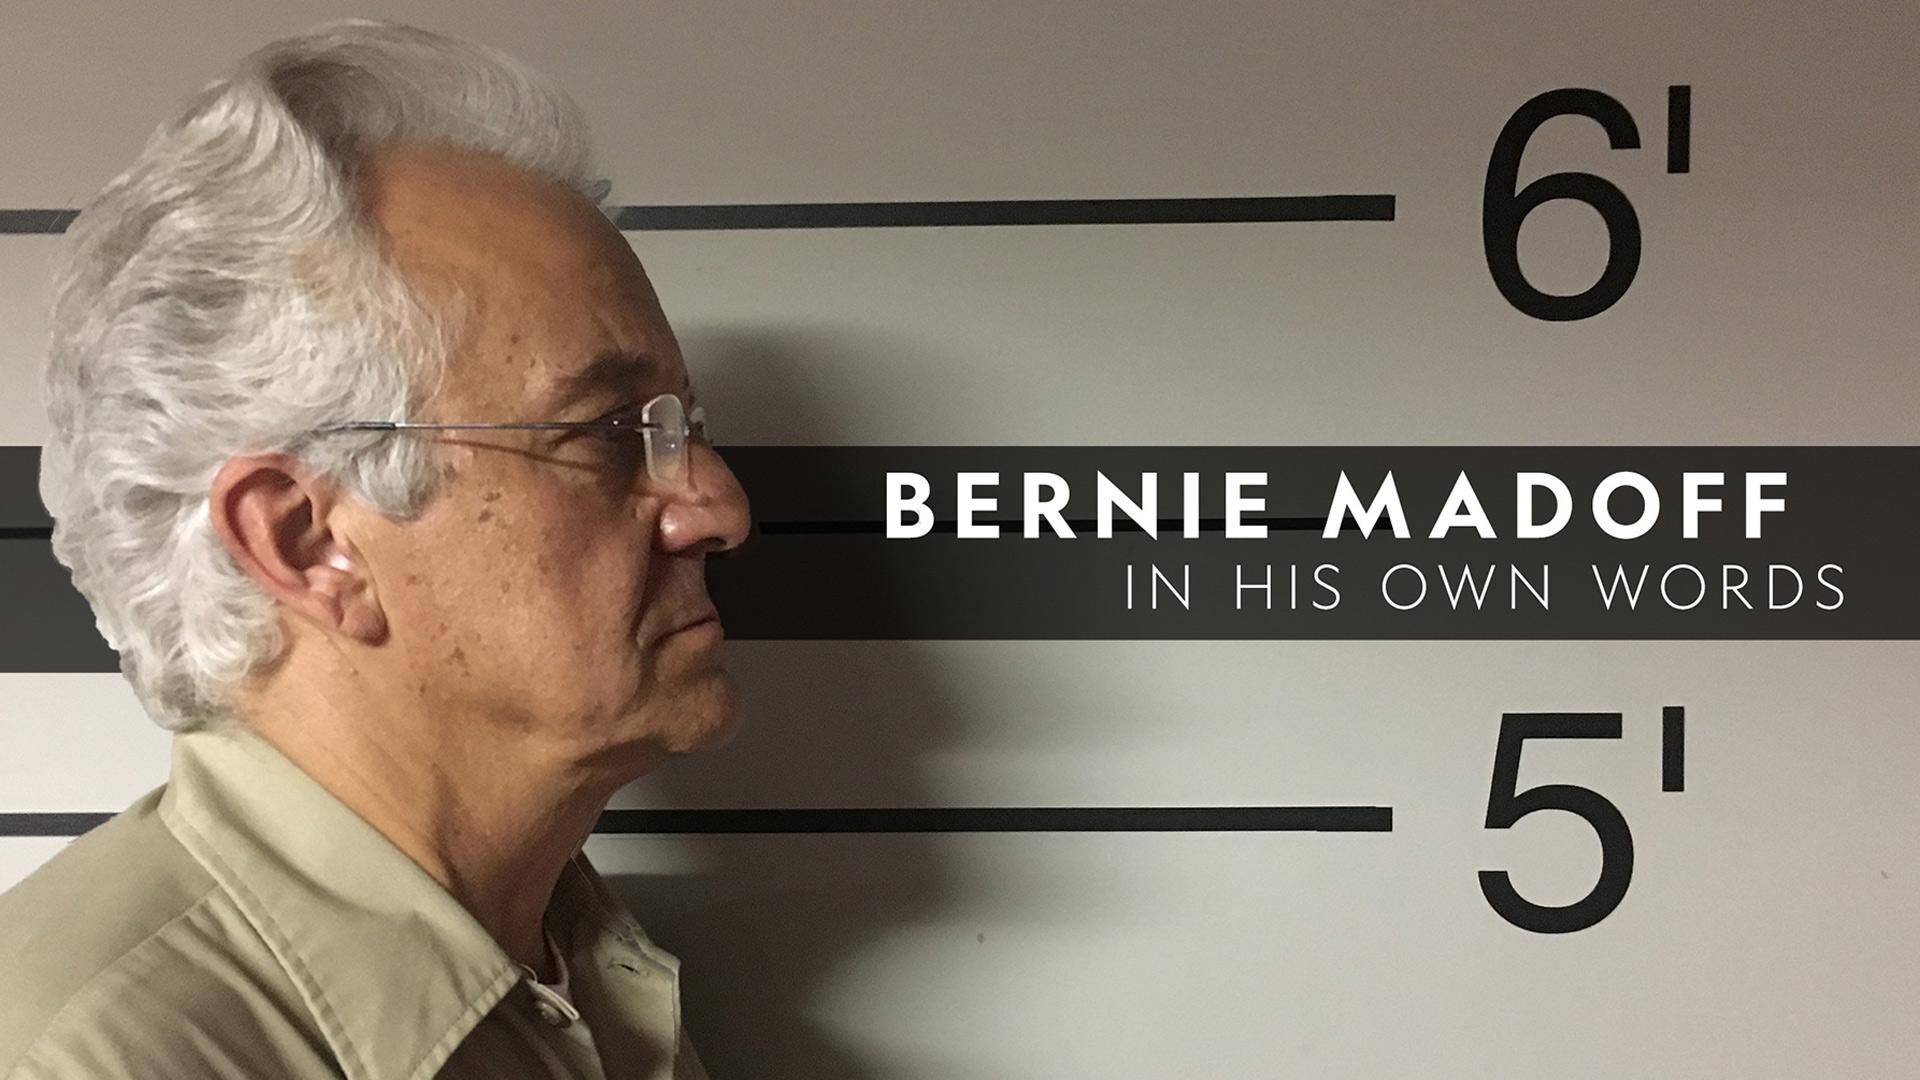 Bernie Madoff In His Own Words